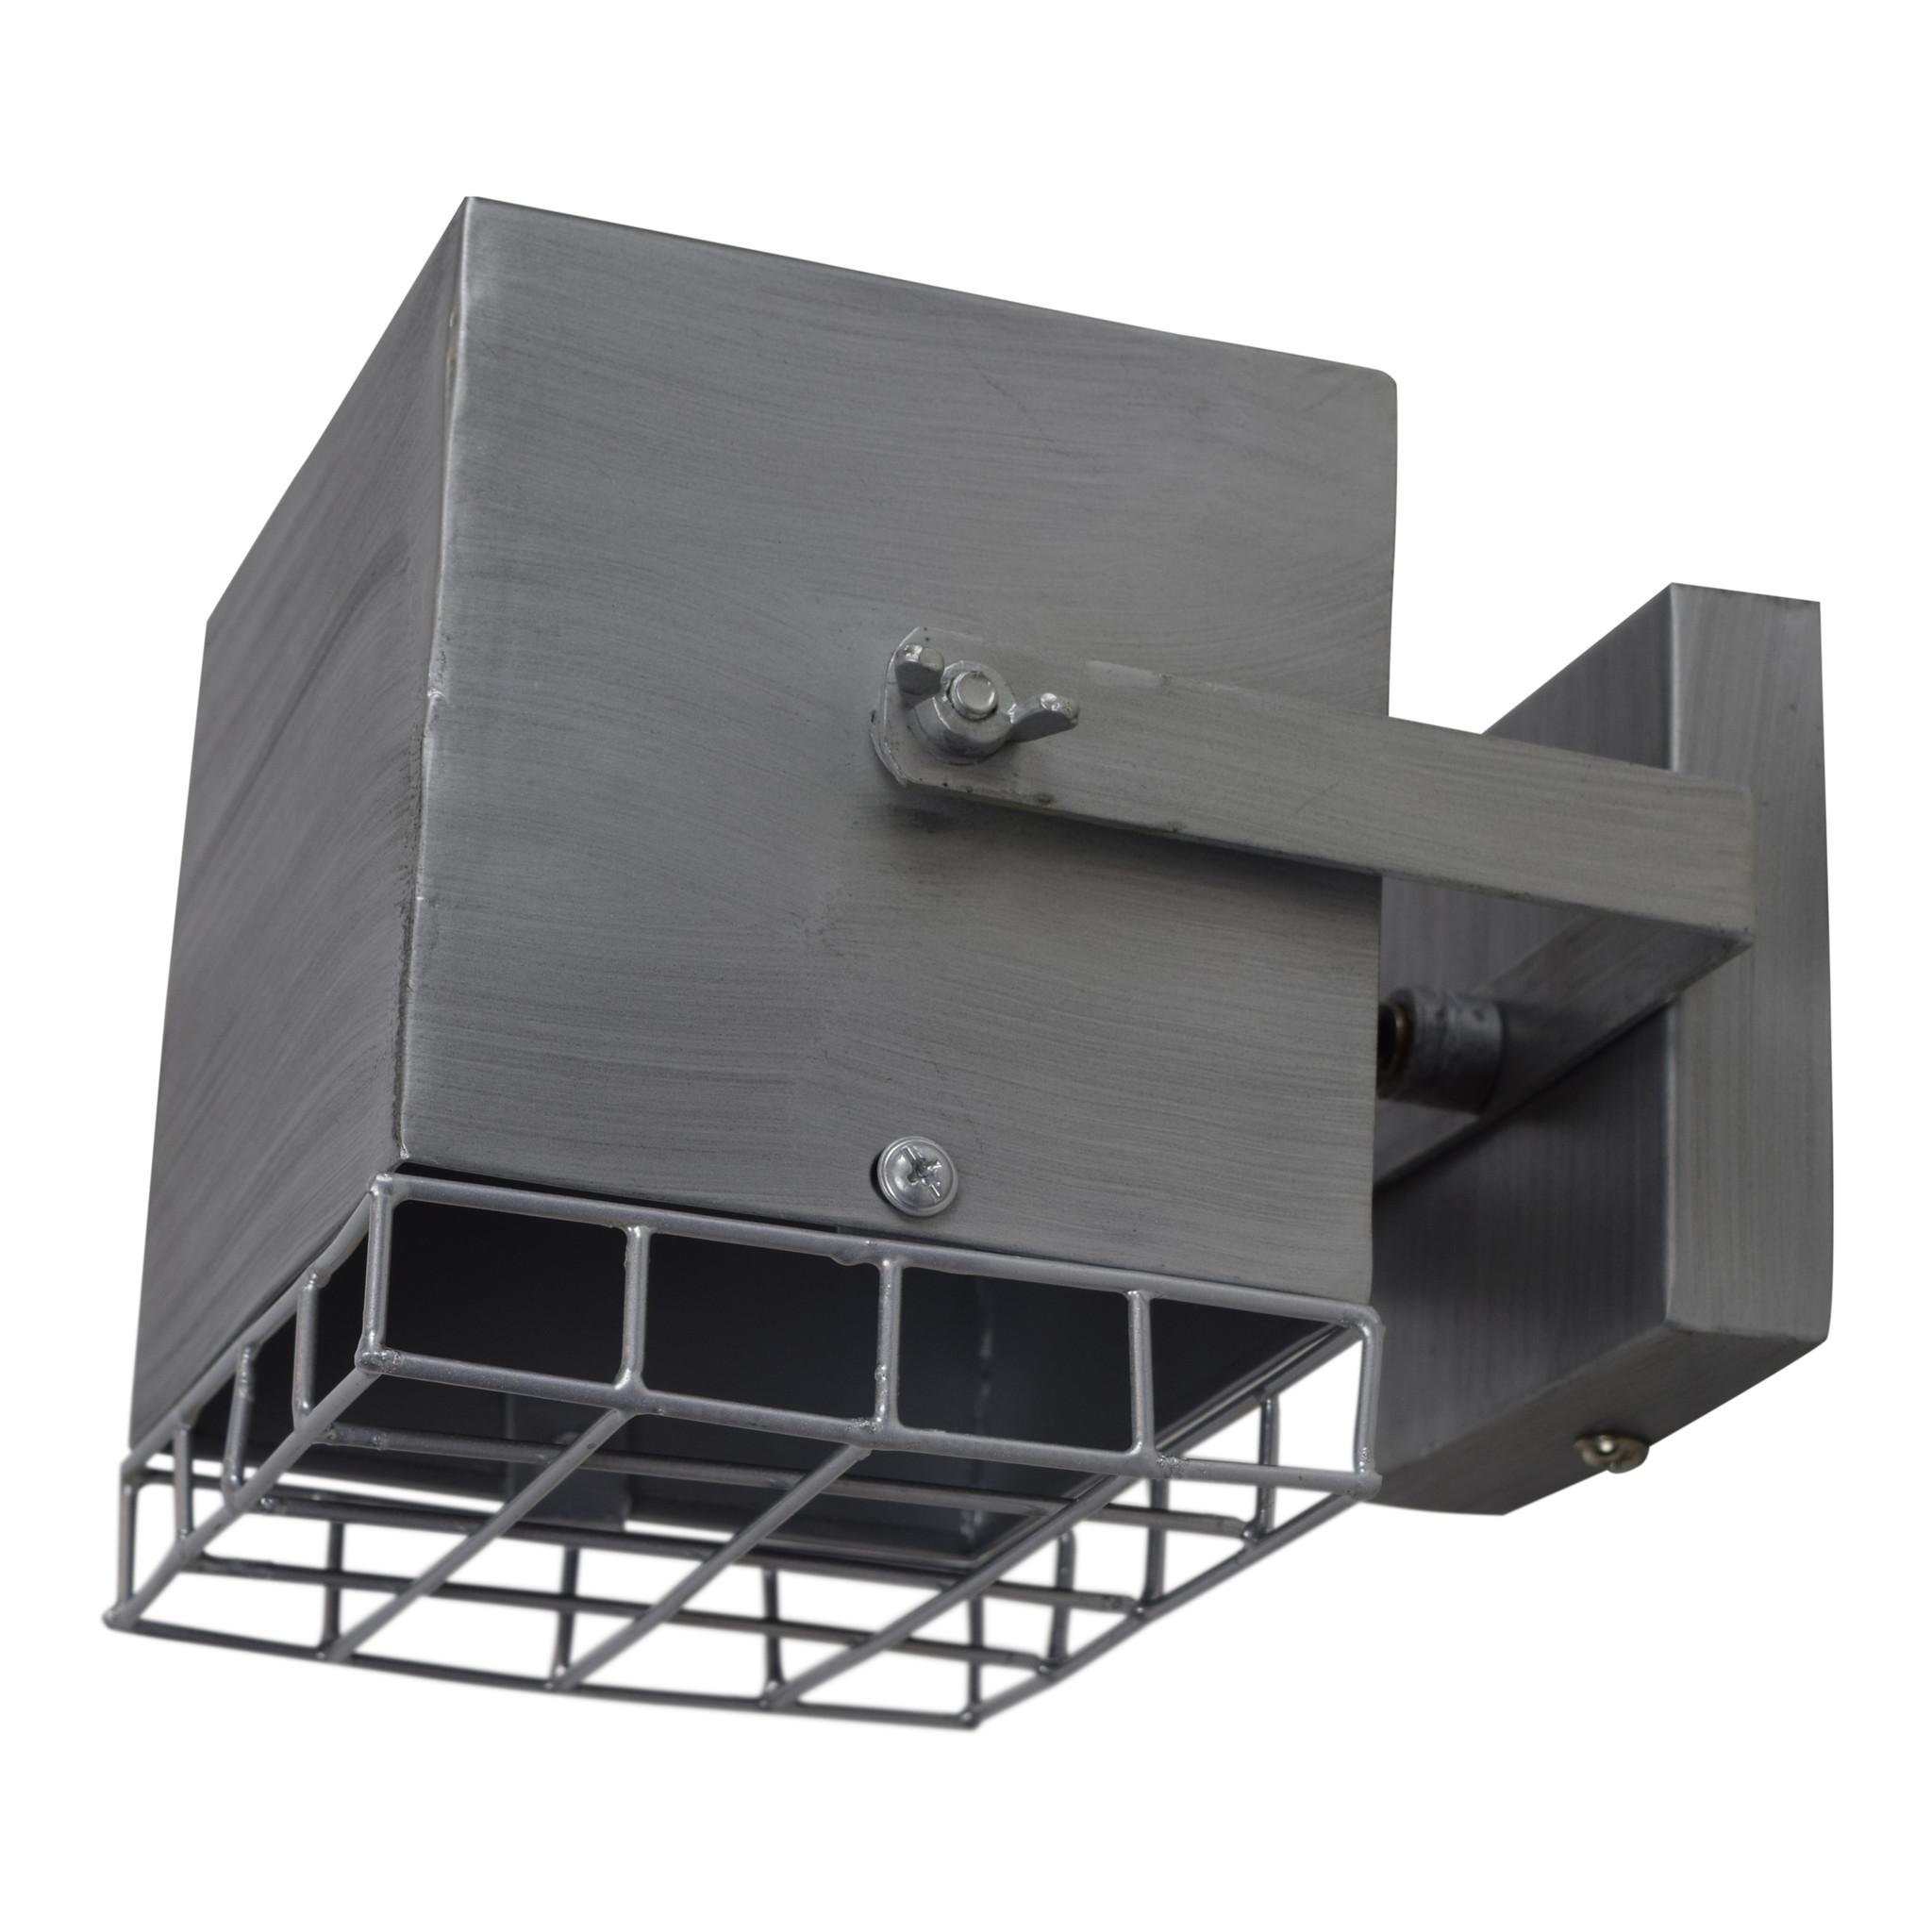 Urban Interiors Urban Interiors Wandlamp Cube Antique zink-AI-WL-11-AZ-8718868314895